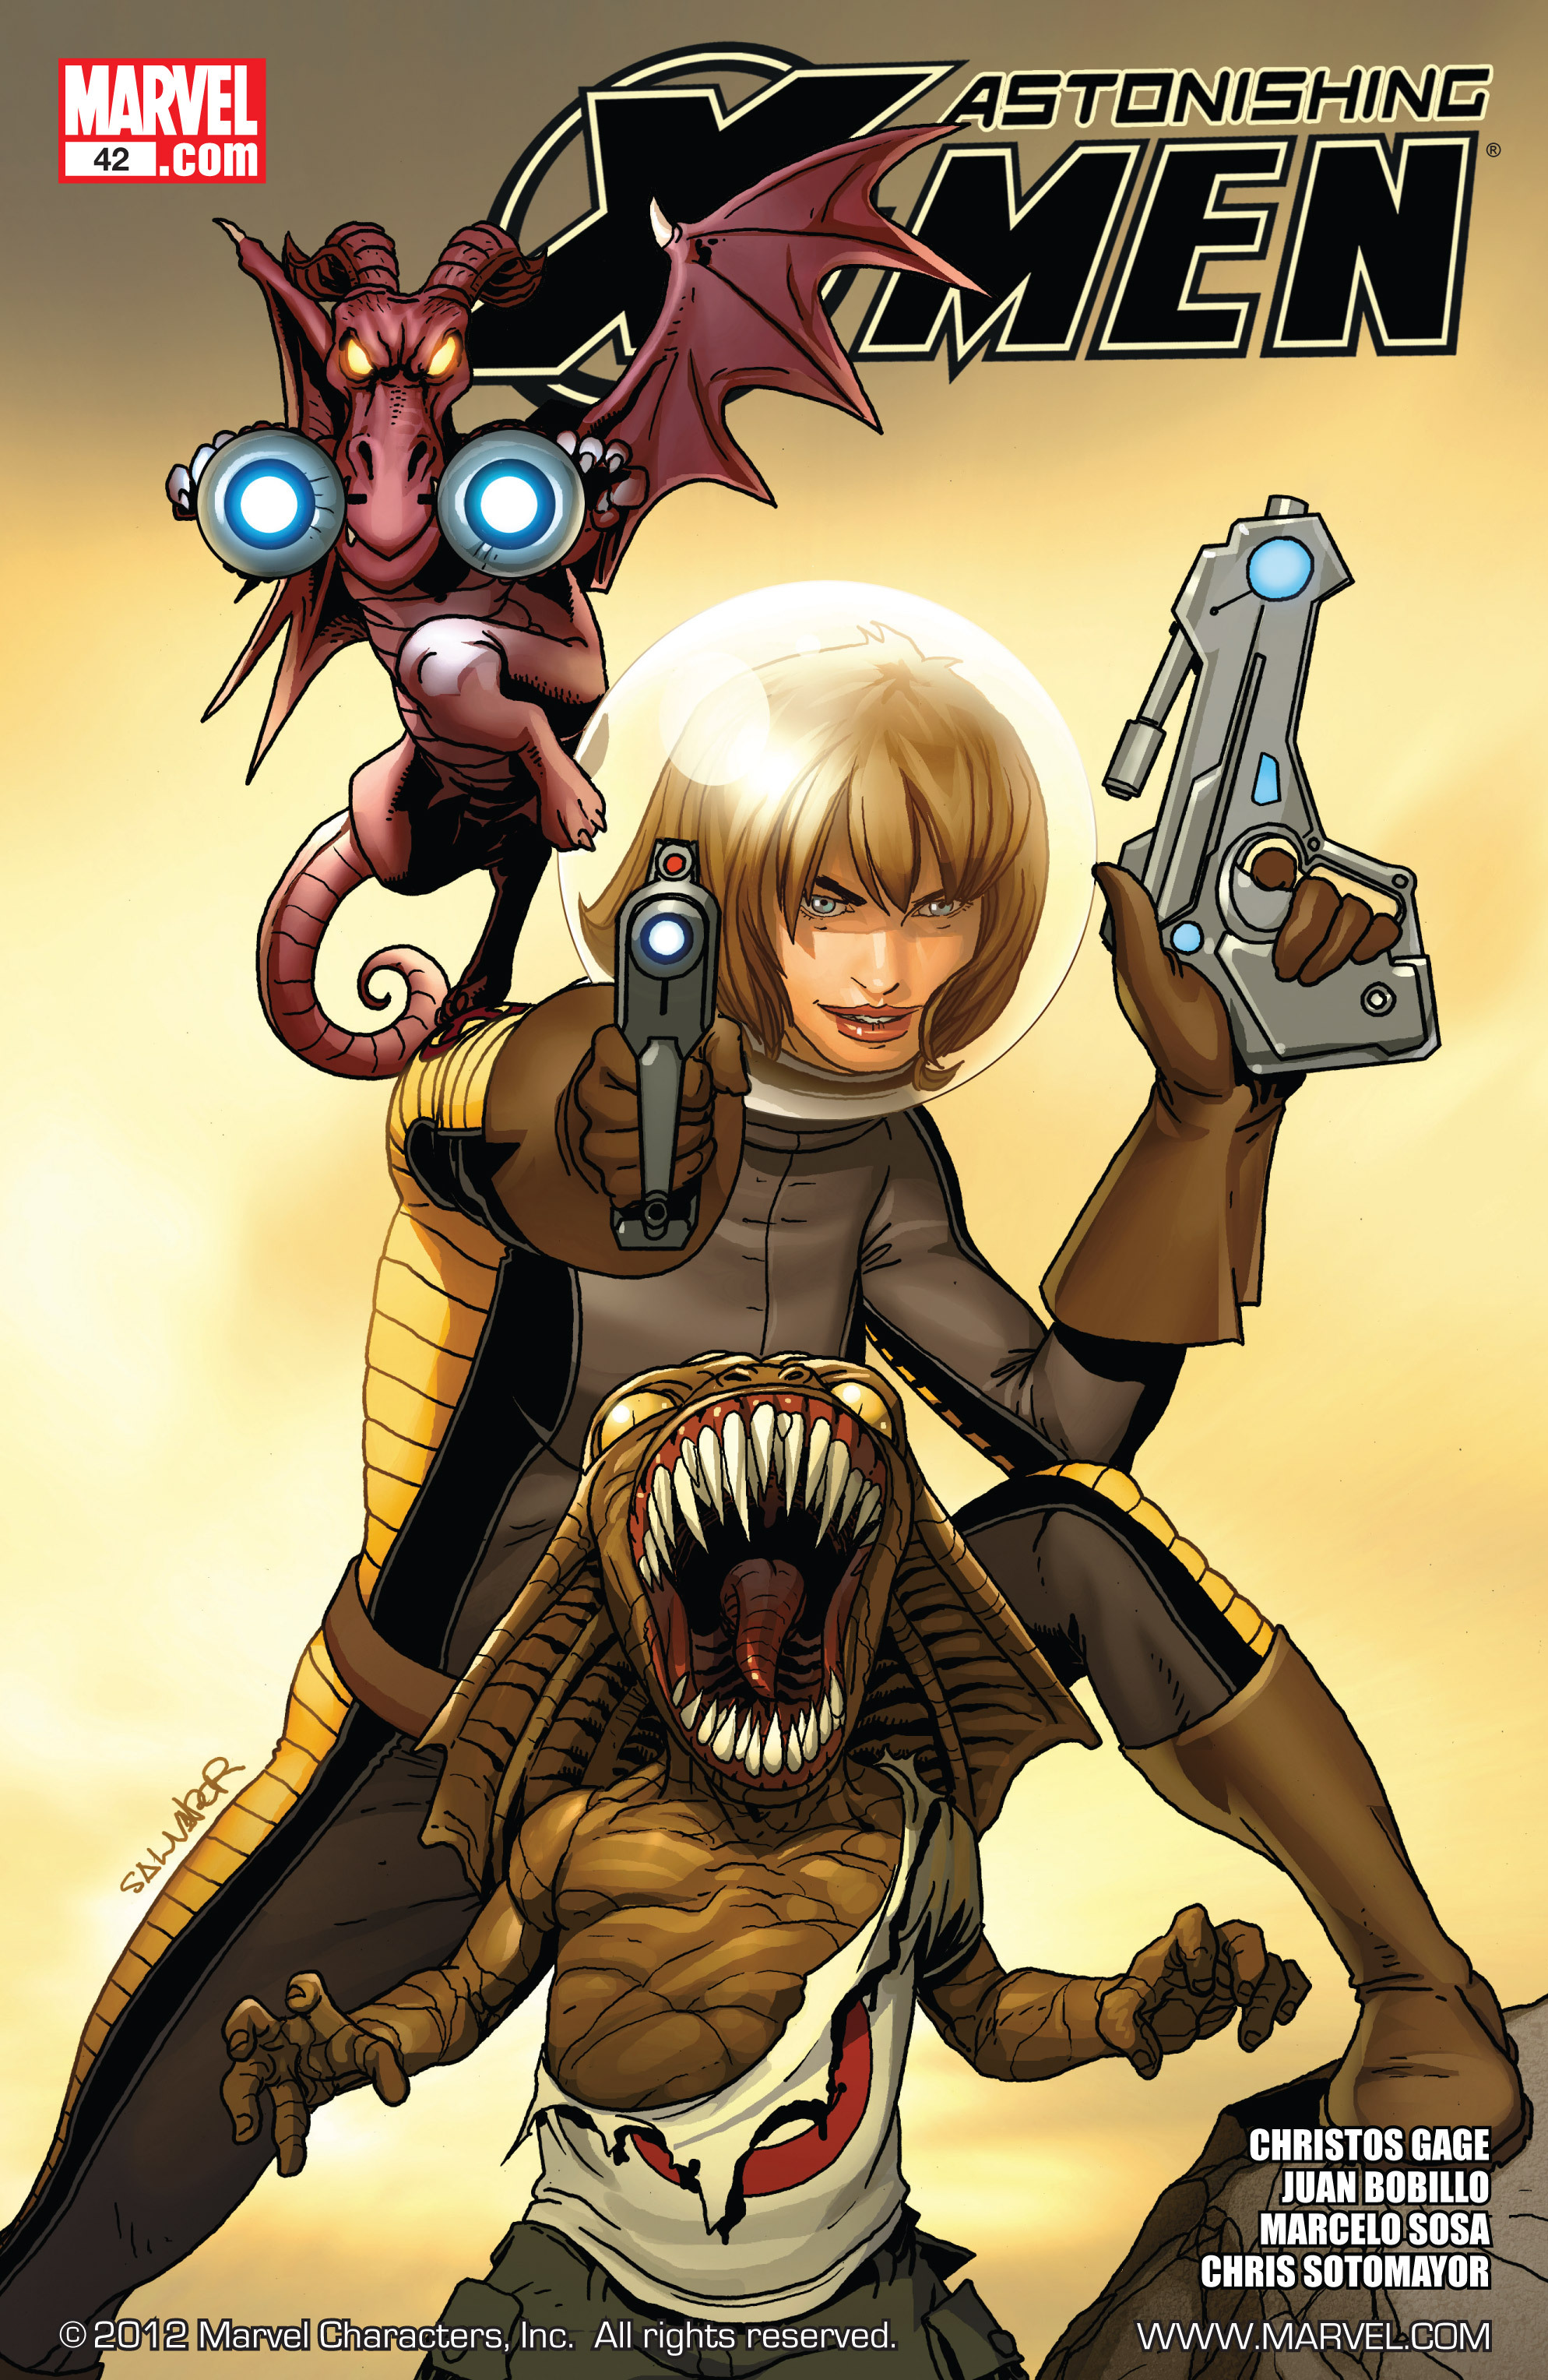 Read online Astonishing X-Men (2004) comic -  Issue #42 - 1